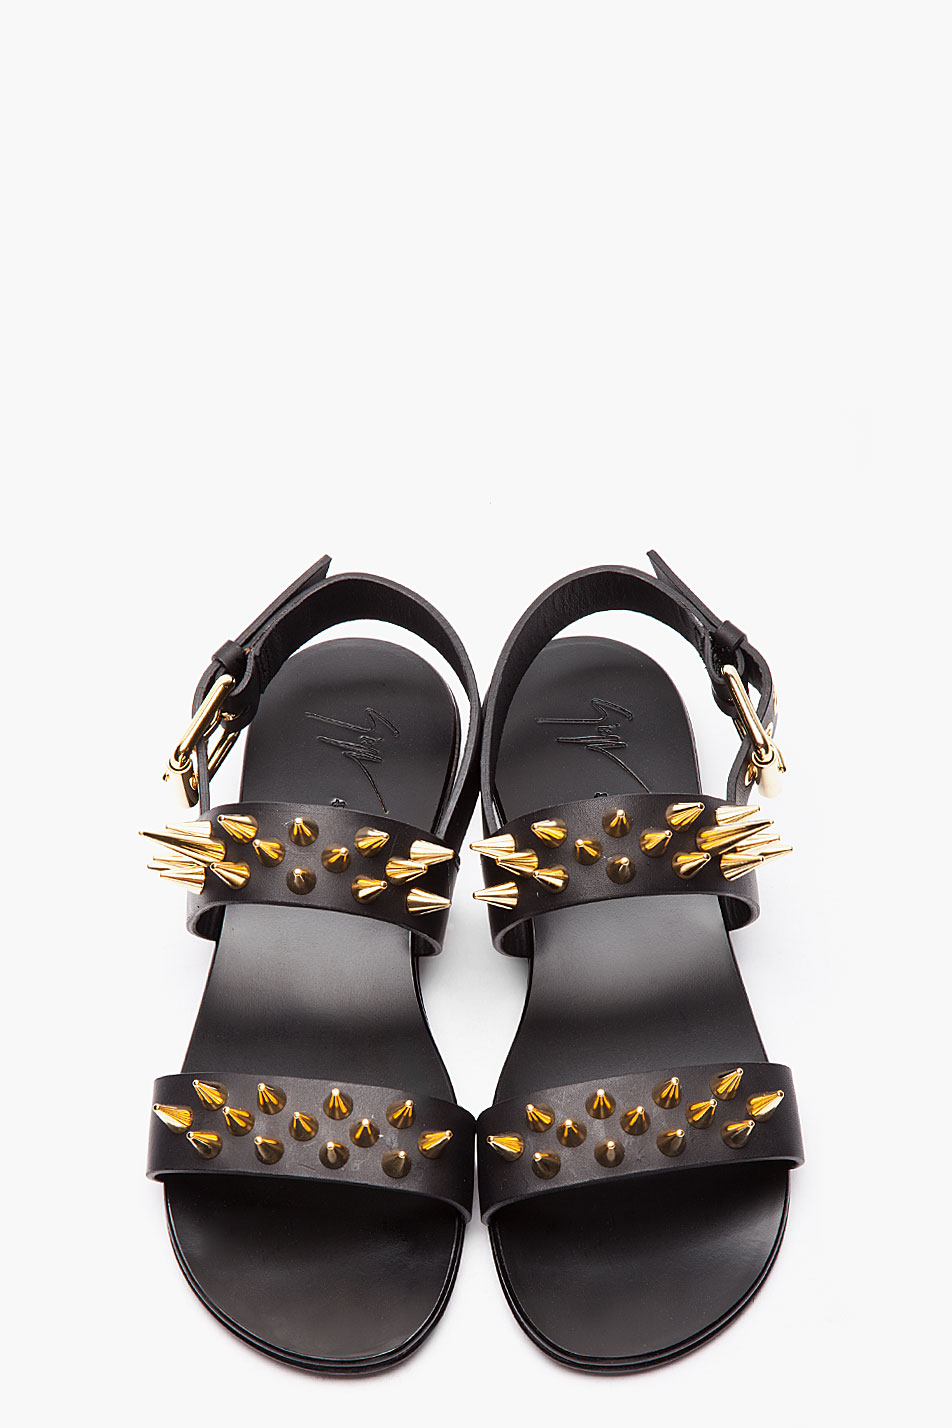 3c38bea0d Lyst - Giuseppe Zanotti Black Leather and Gold Studded Zak 10 ...